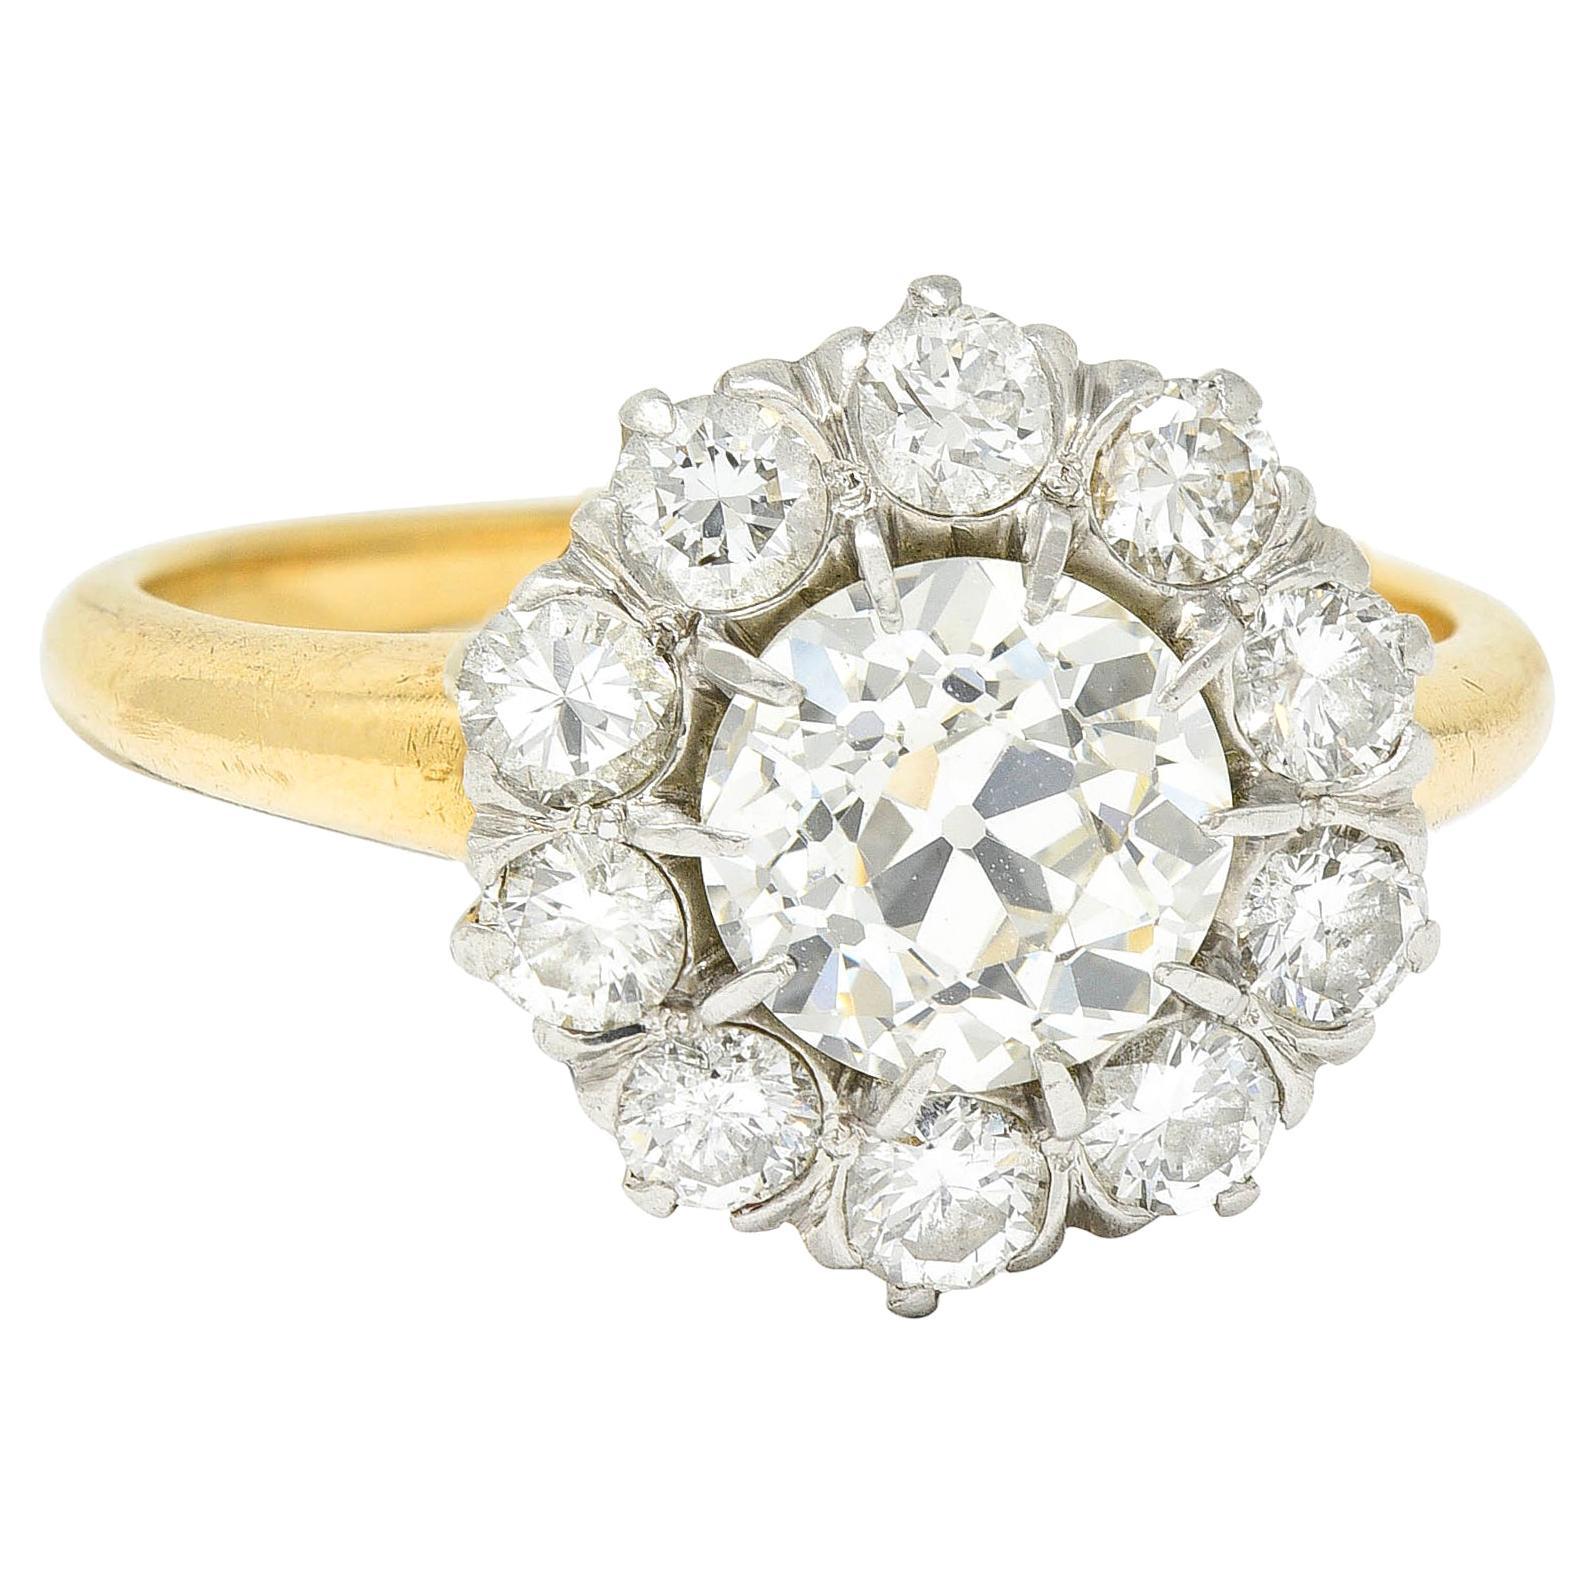 Edwardian 2.14 Carats Diamond Platinum 14 Karat Gold Cluster Engagement Ring